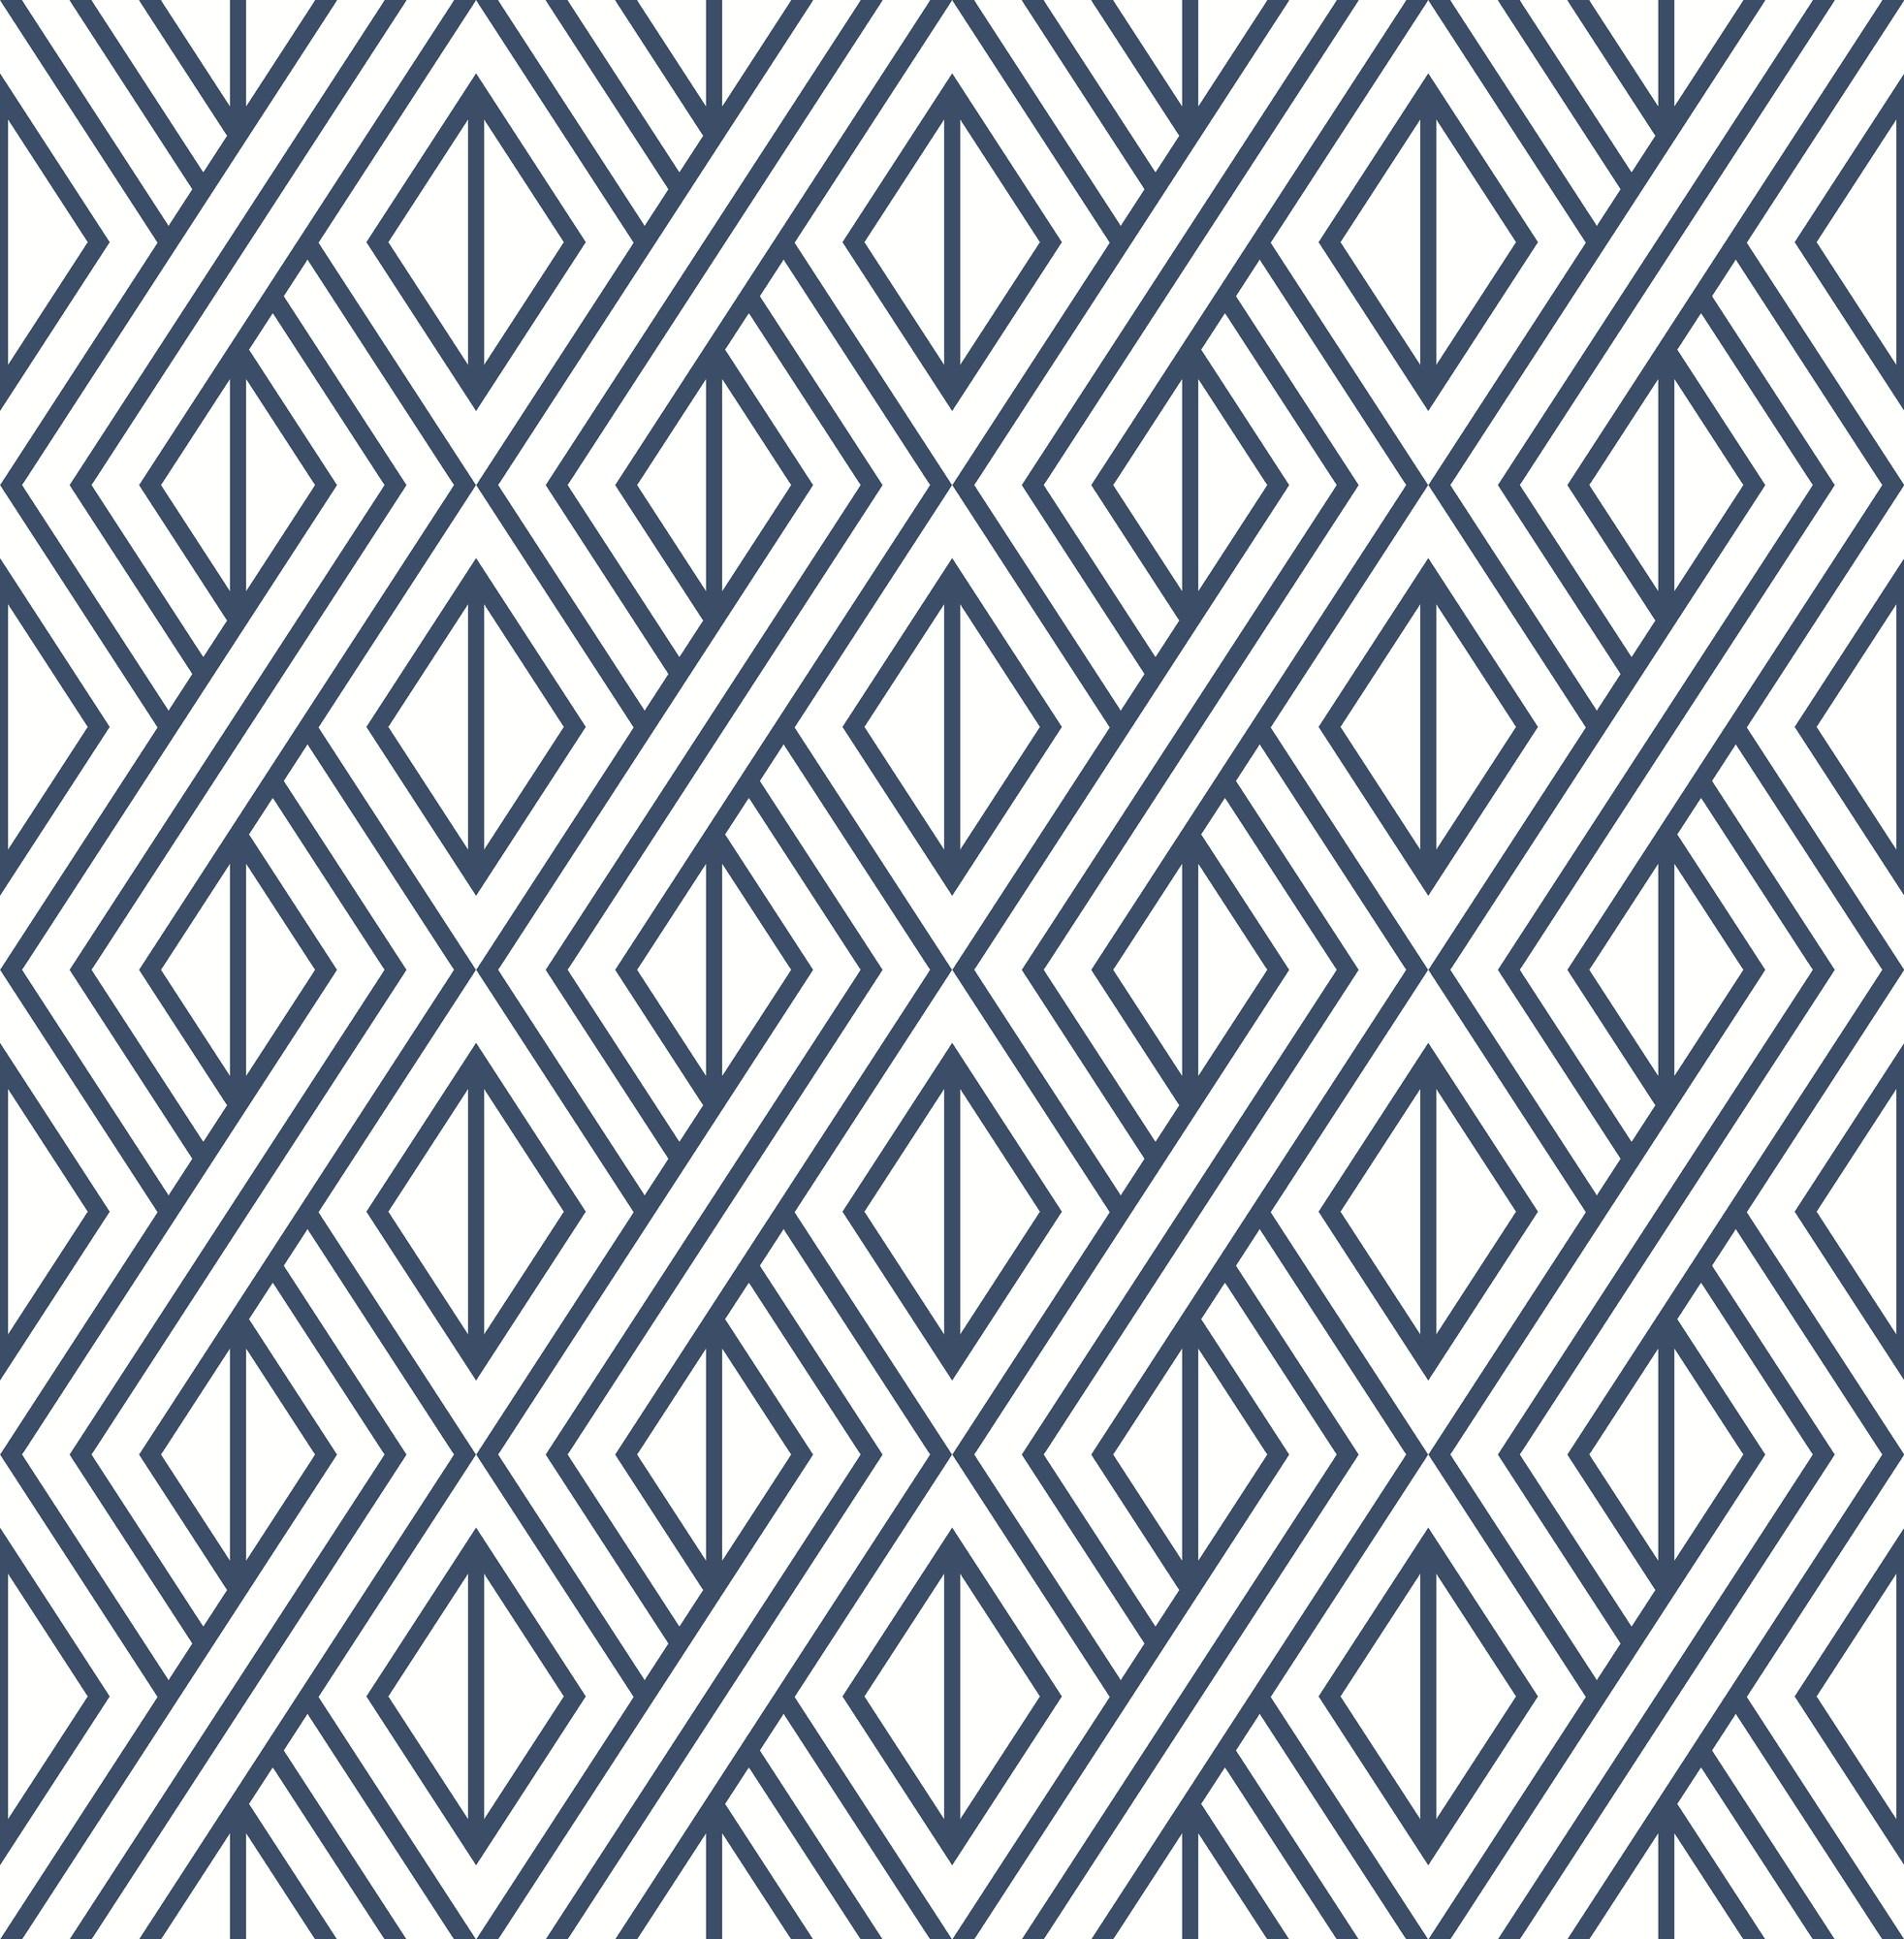 Nextwall Nw30106 Diamond Geometric Navy Blue Peel Stick Wallpaper The Savvy Decorator